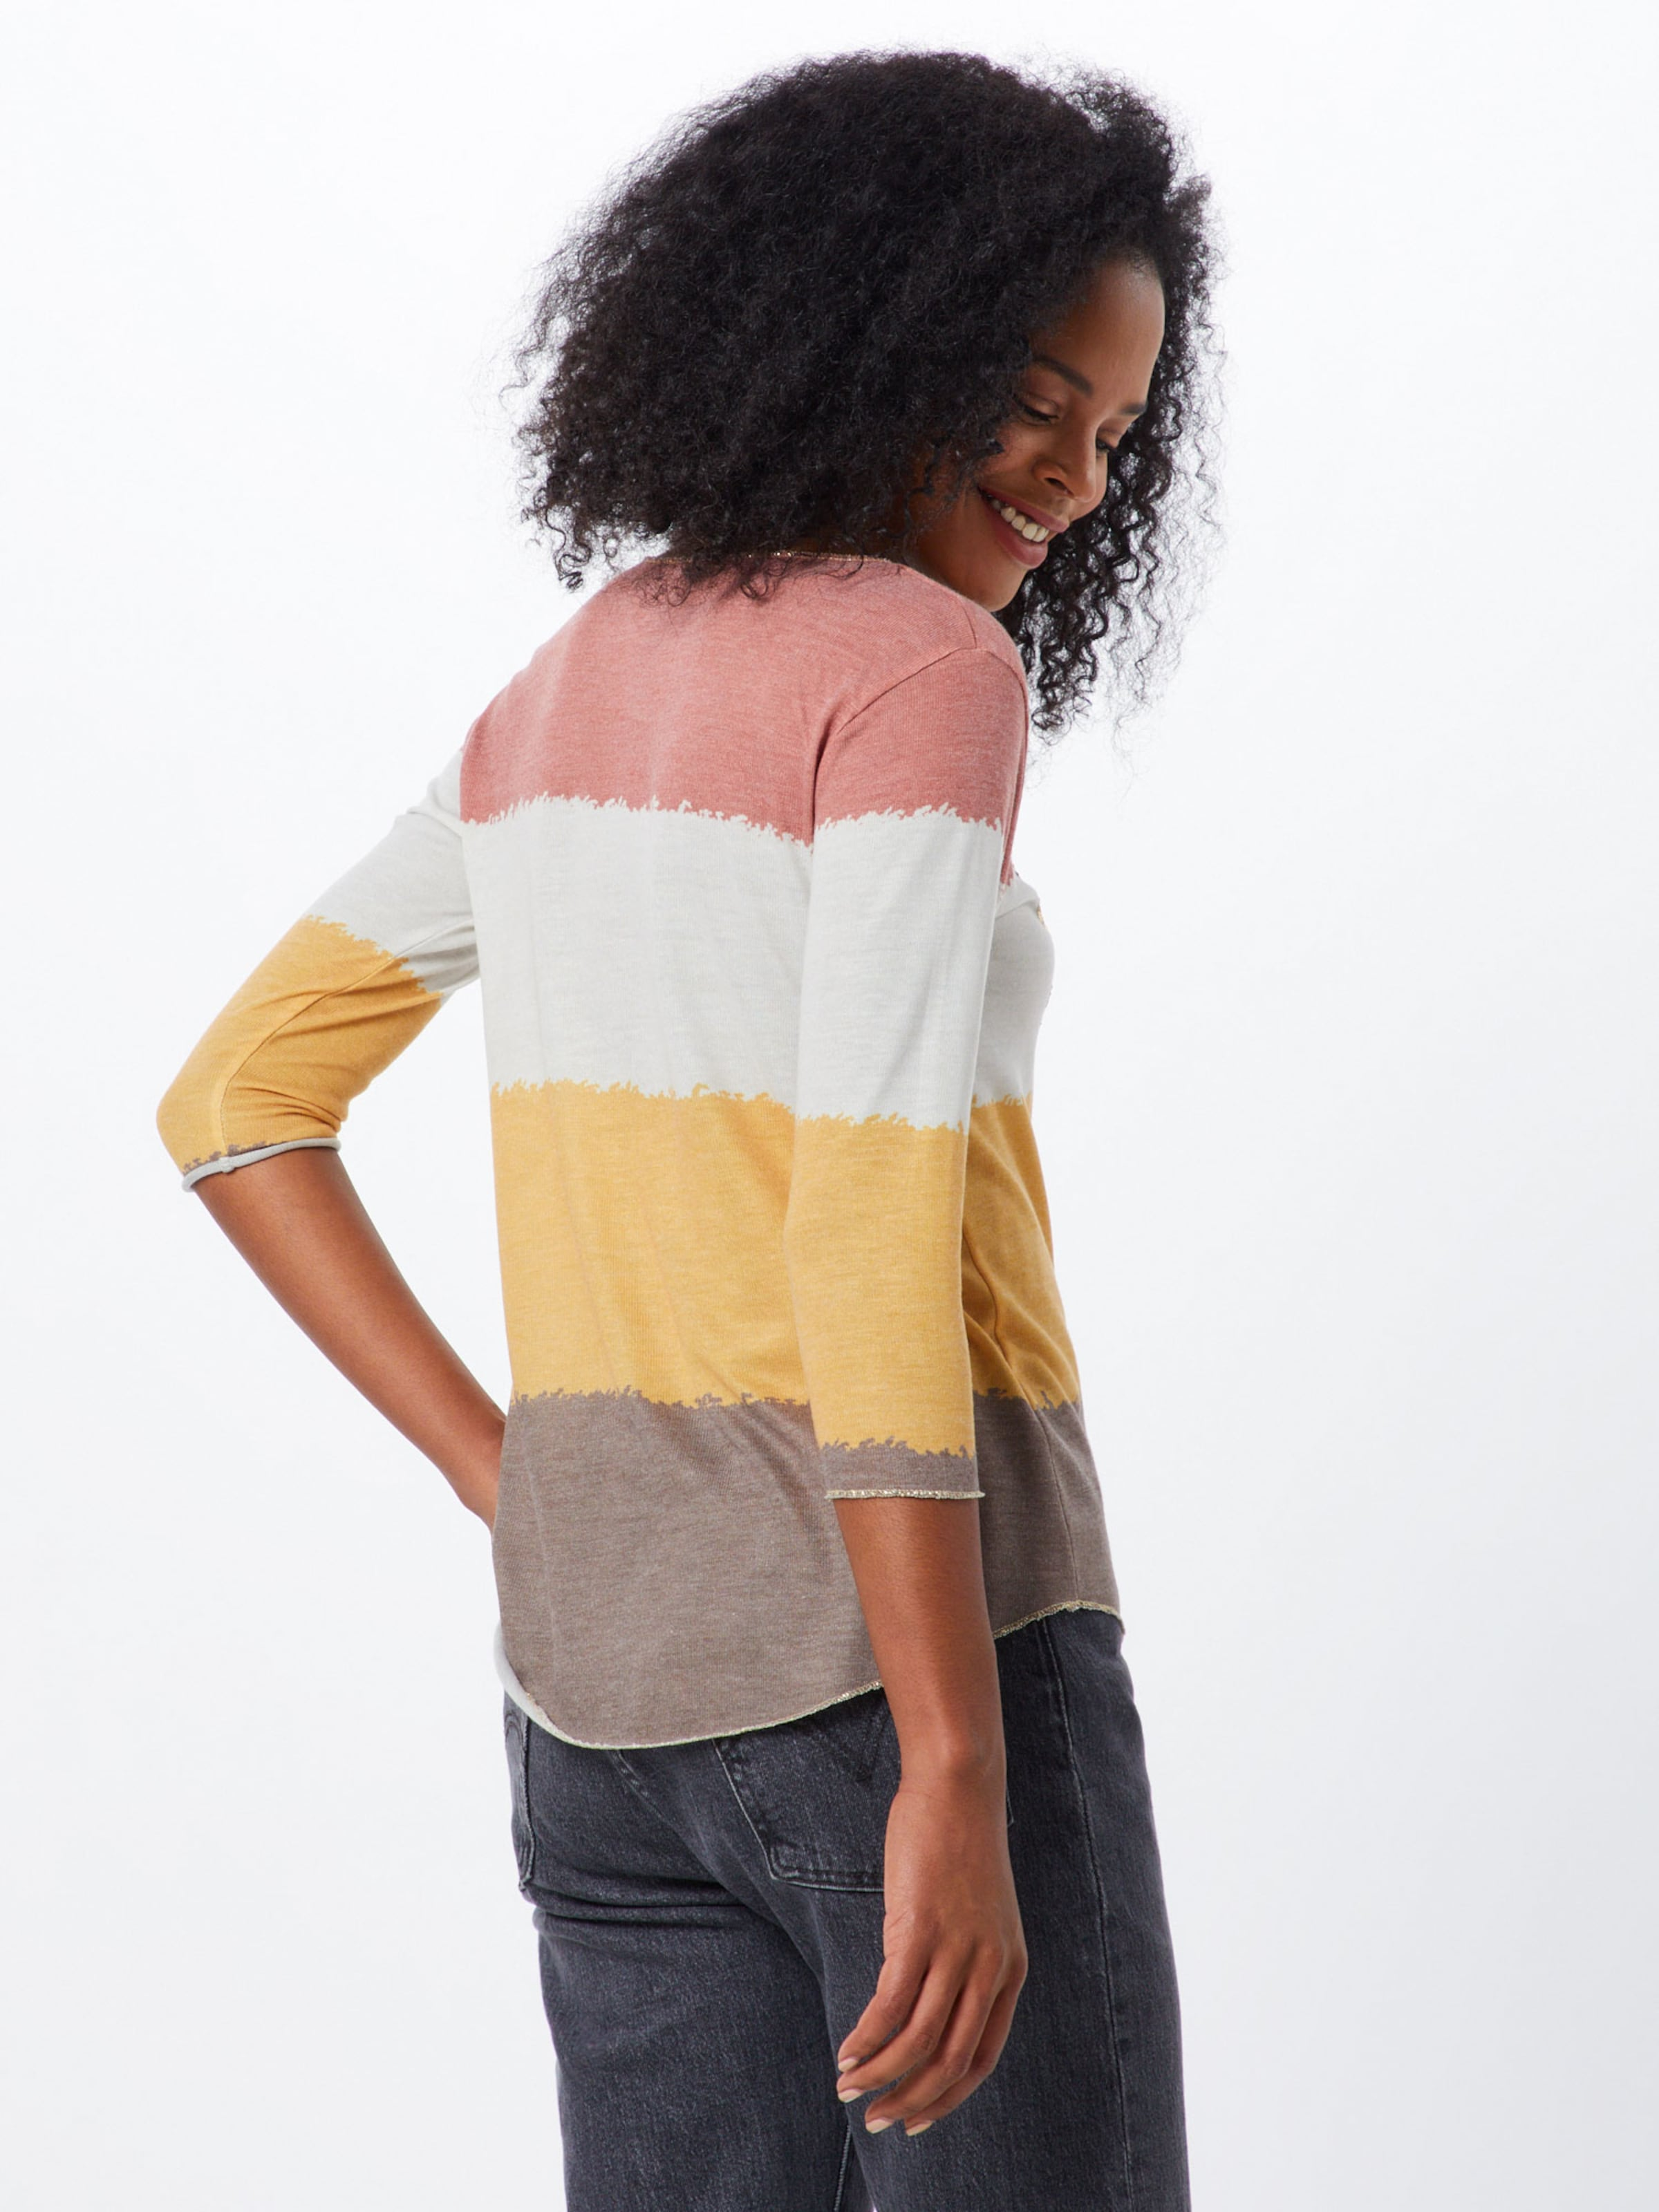 Round' Shirt Largo Soul In GelbRot Key 'wls wn0PkOX8